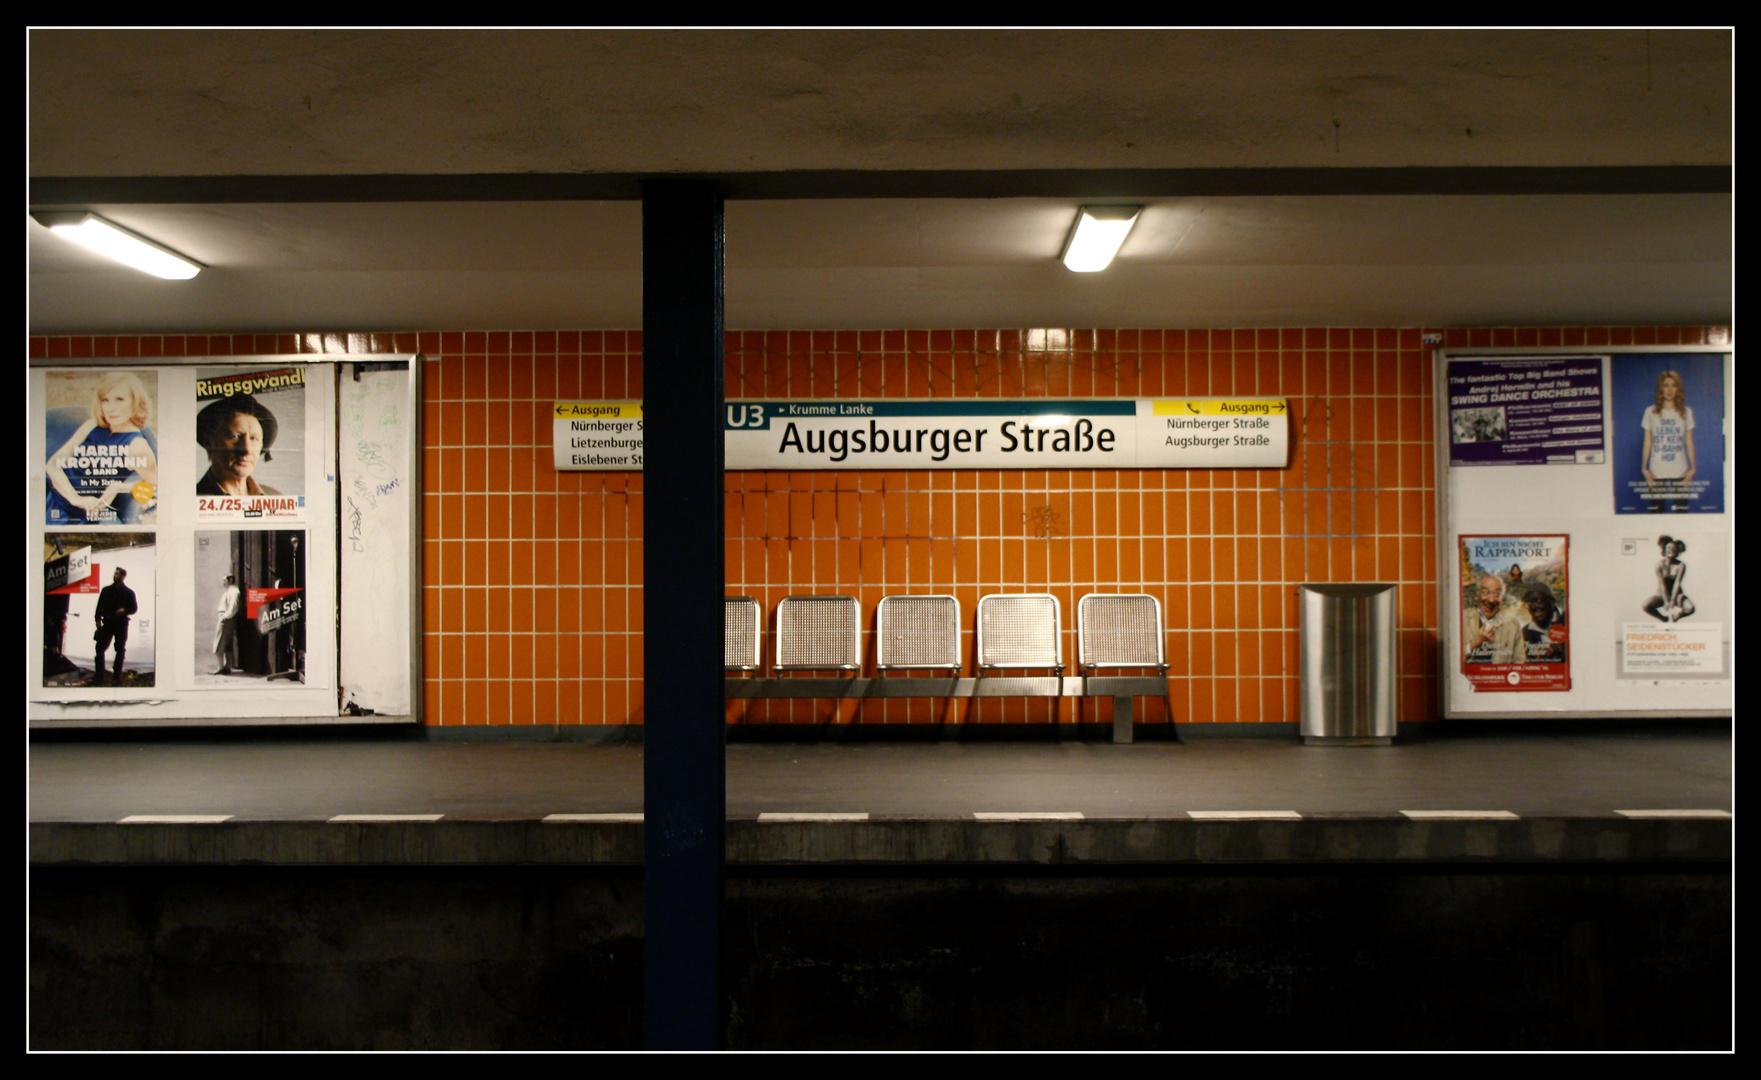 Augsburger Str,